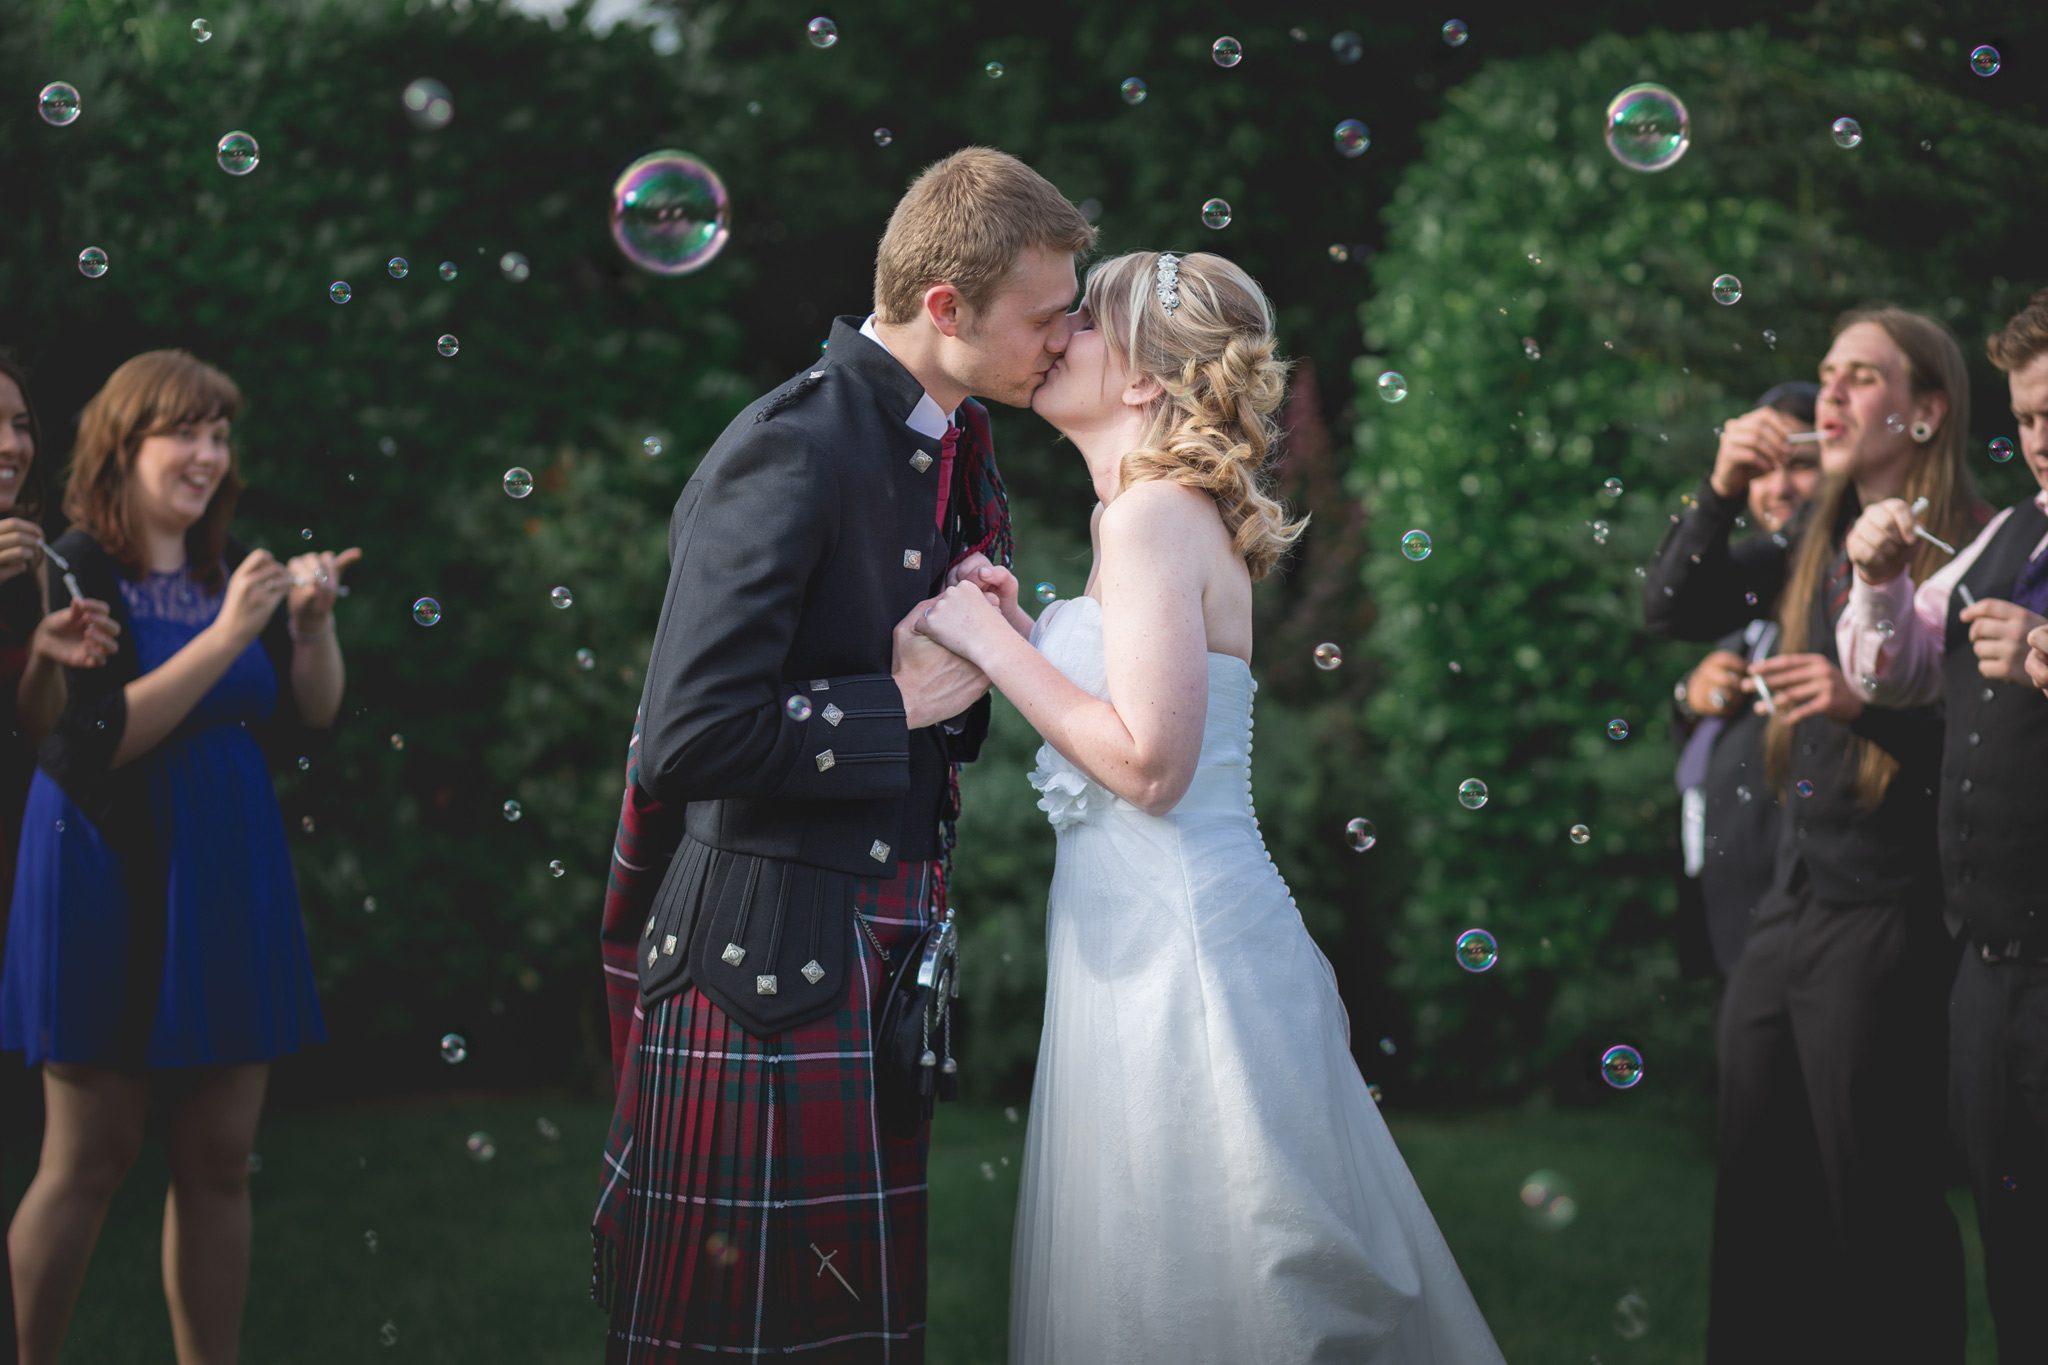 The Three Horseshoes Inn Wedding - Bubbles